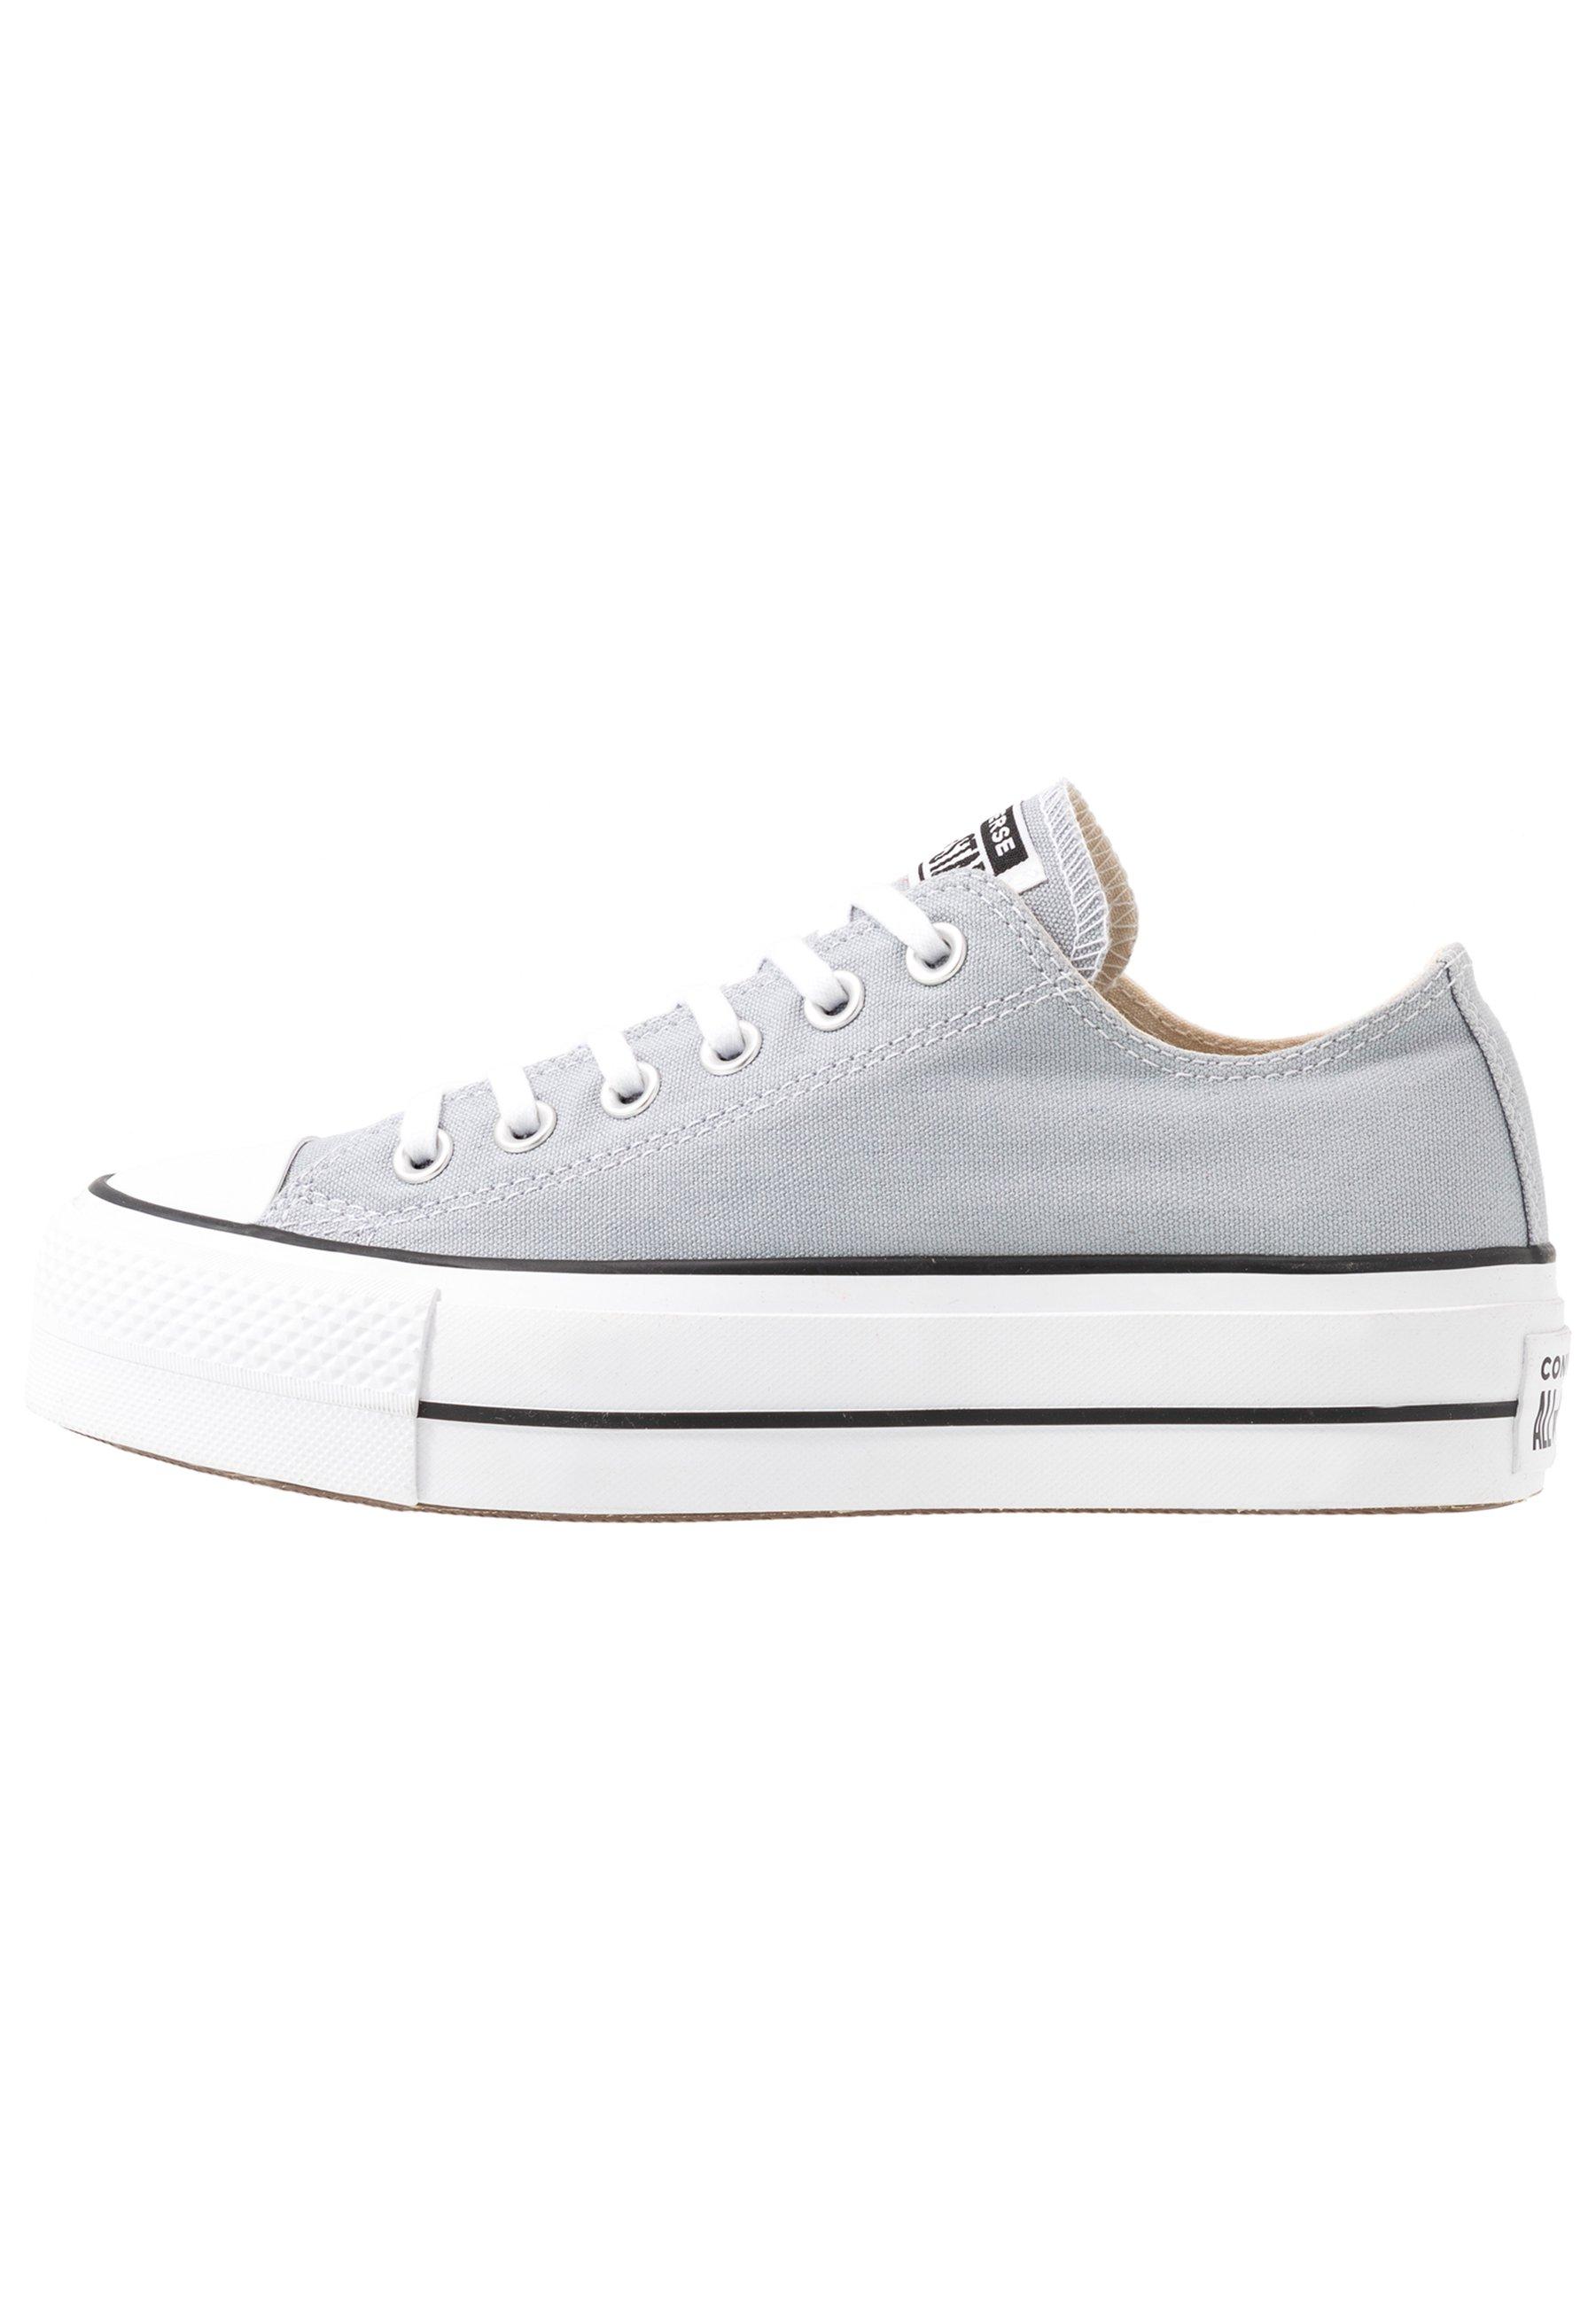 CHUCK TAYLOR ALL STAR LIFT SEASONAL Sneaker low wolf greywhiteblack